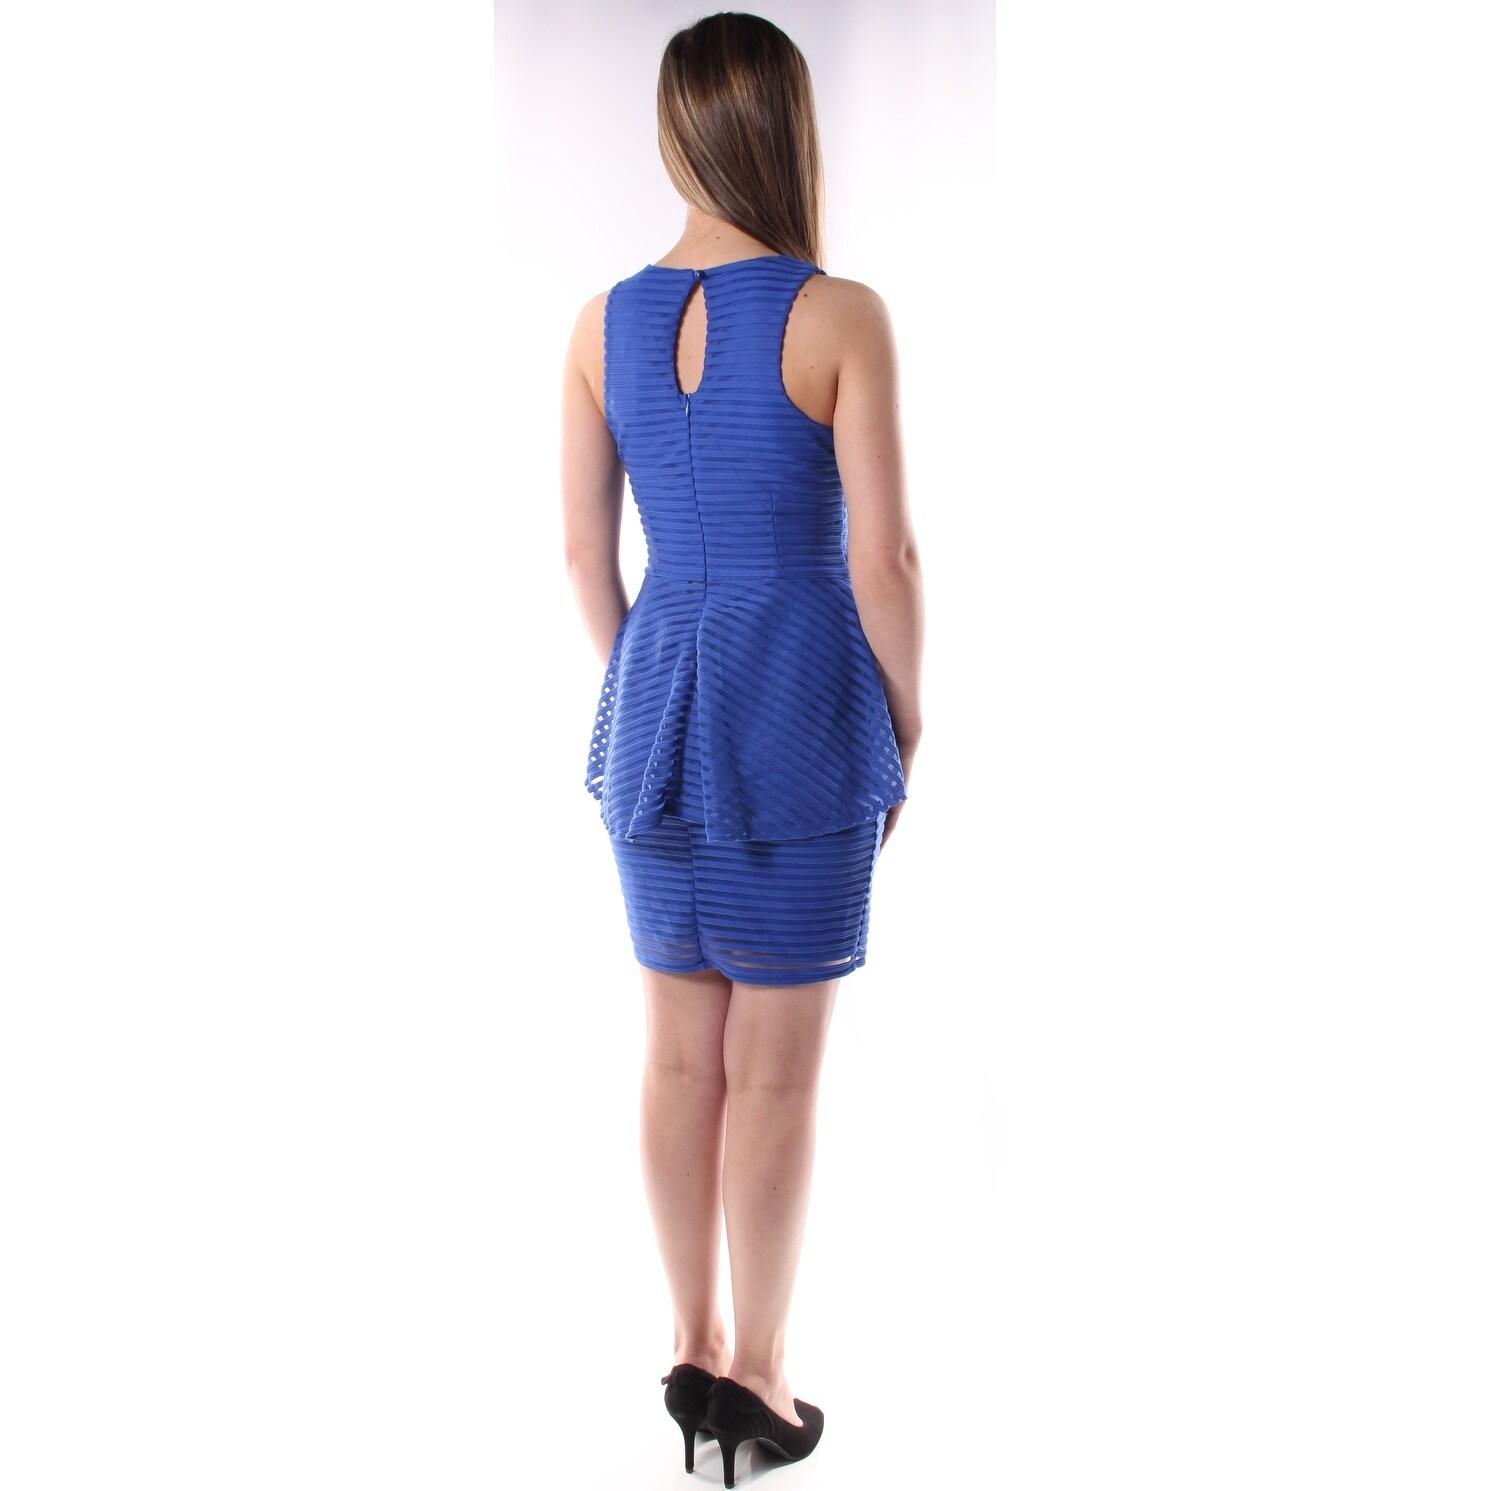 e98200f3459d Shop MATERIAL GIRL Womens Blue NAVEL AREA CUTOUT Sleeveless Jewel Neck Knee  Length Peplum Dress Juniors Size  M - On Sale - Free Shipping On Orders  Over  45 ...